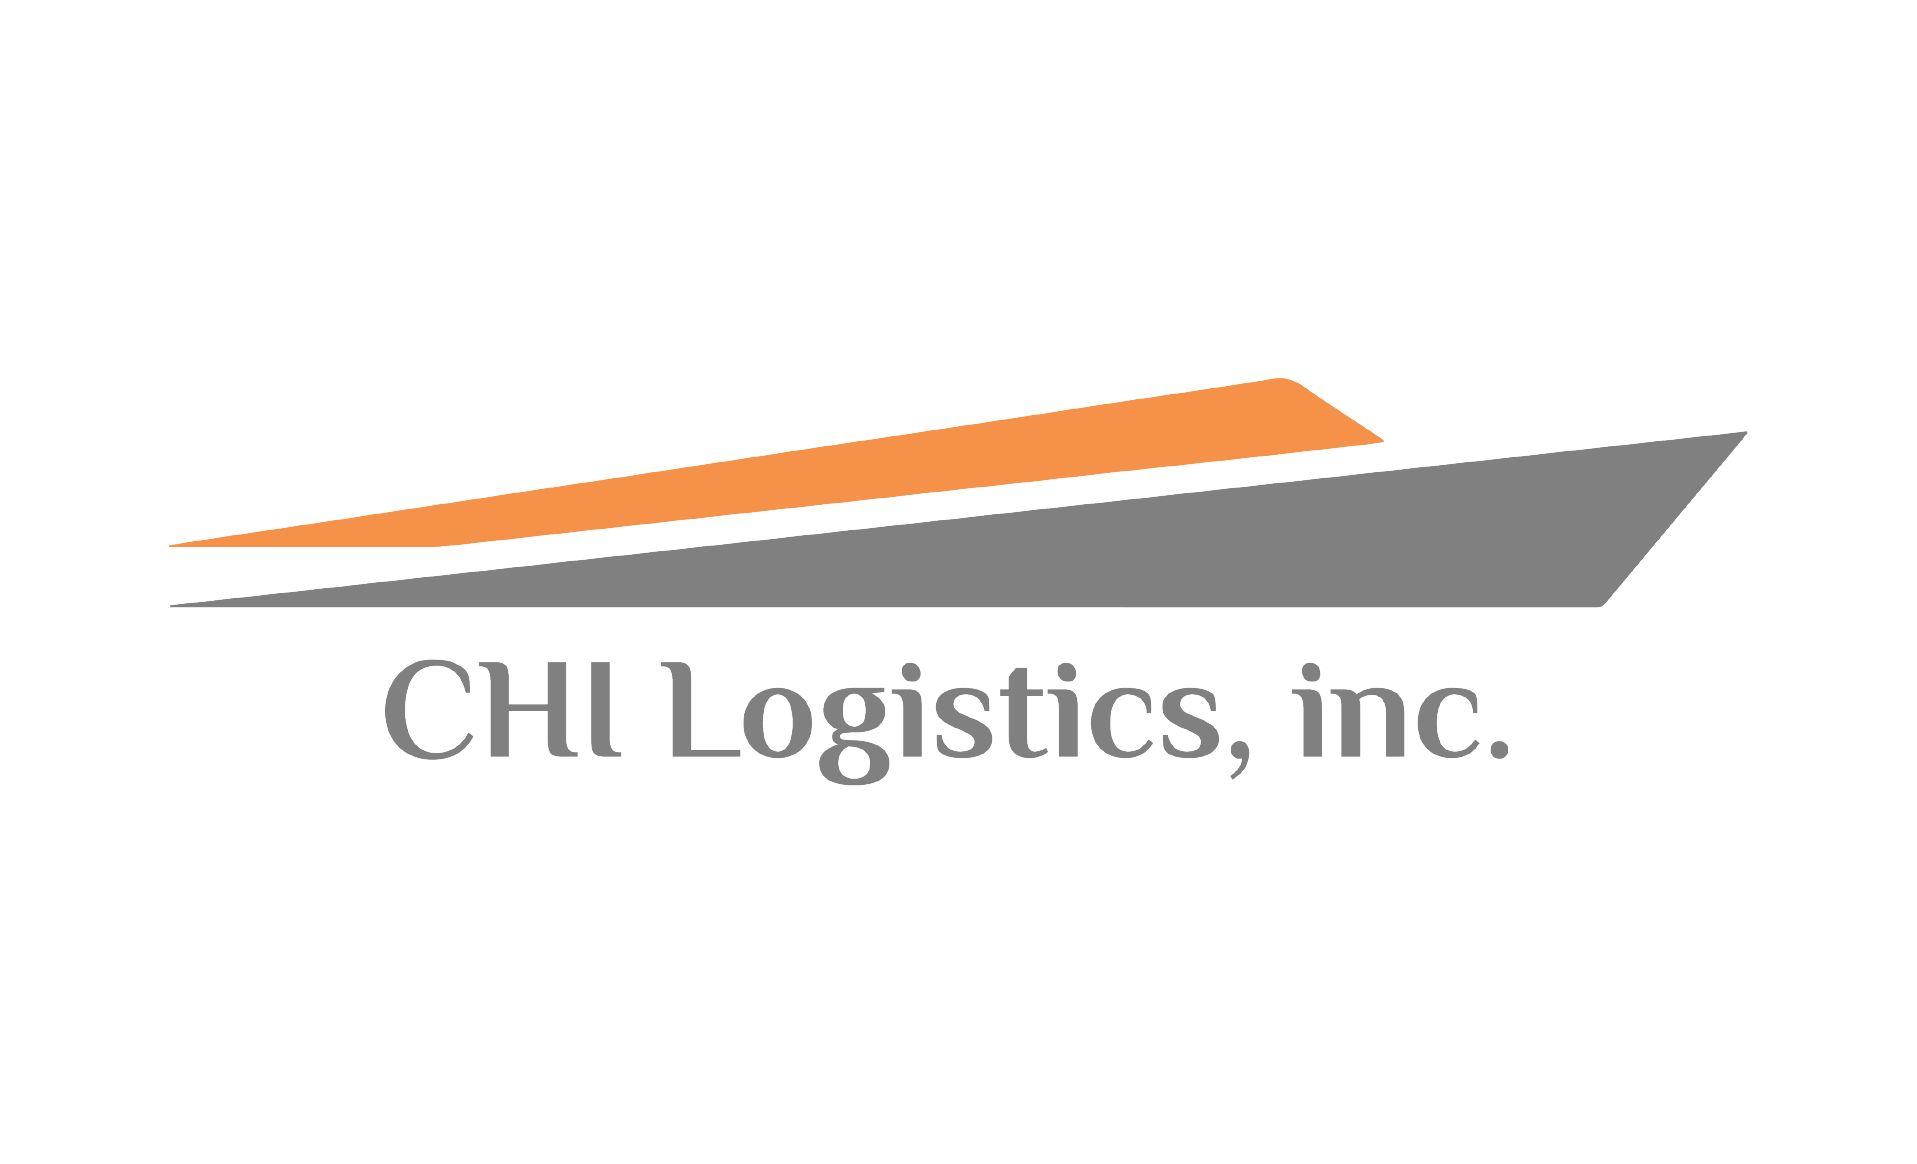 CHI Logistics, inc.